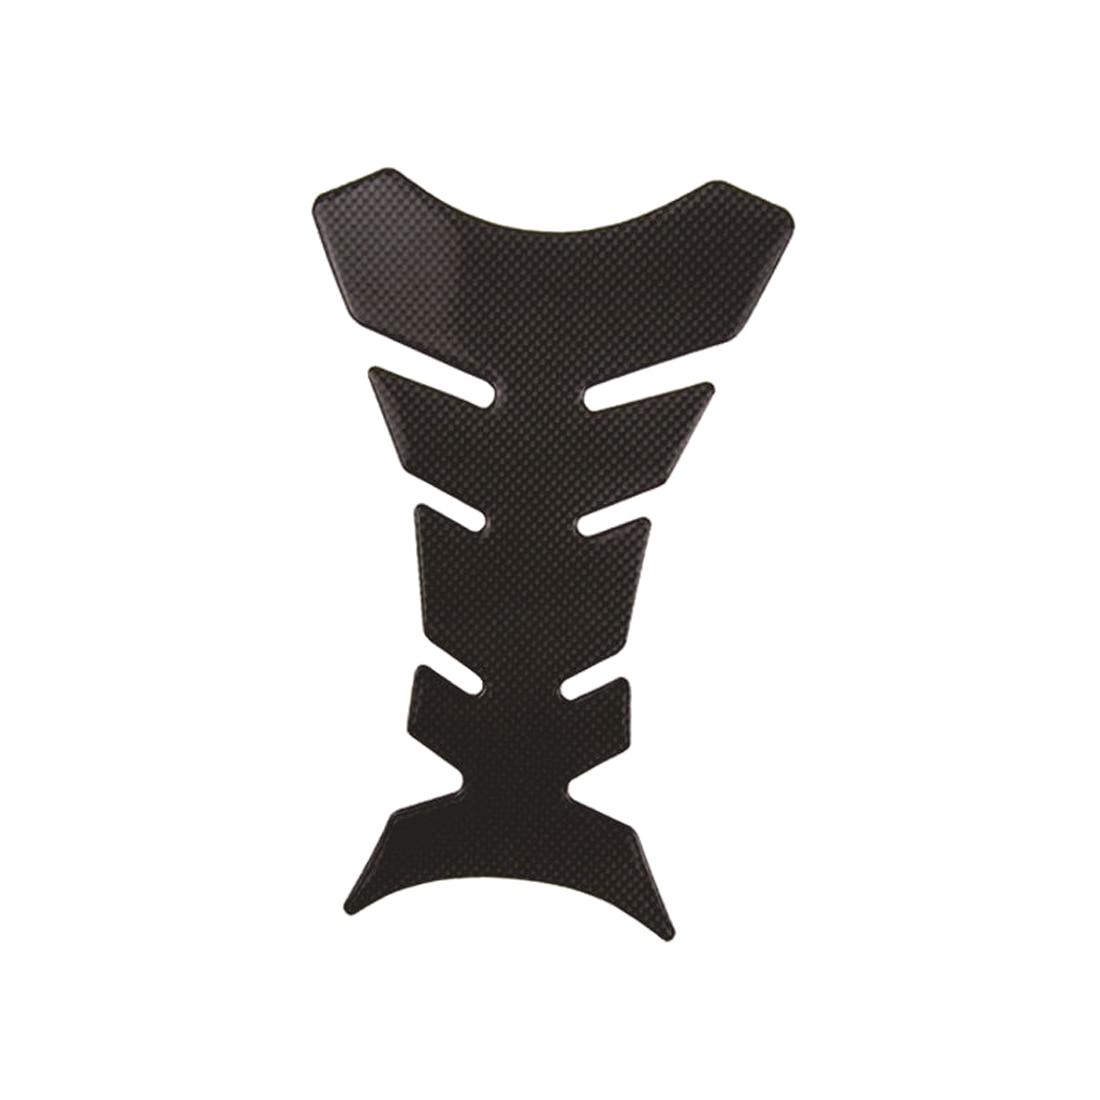 Dewtreetali Carbon Fiber 3D Motorcycle Tank Pad Protector Sticker For Honda kawasaki yamaha suzuki bmw Universal Fishbone